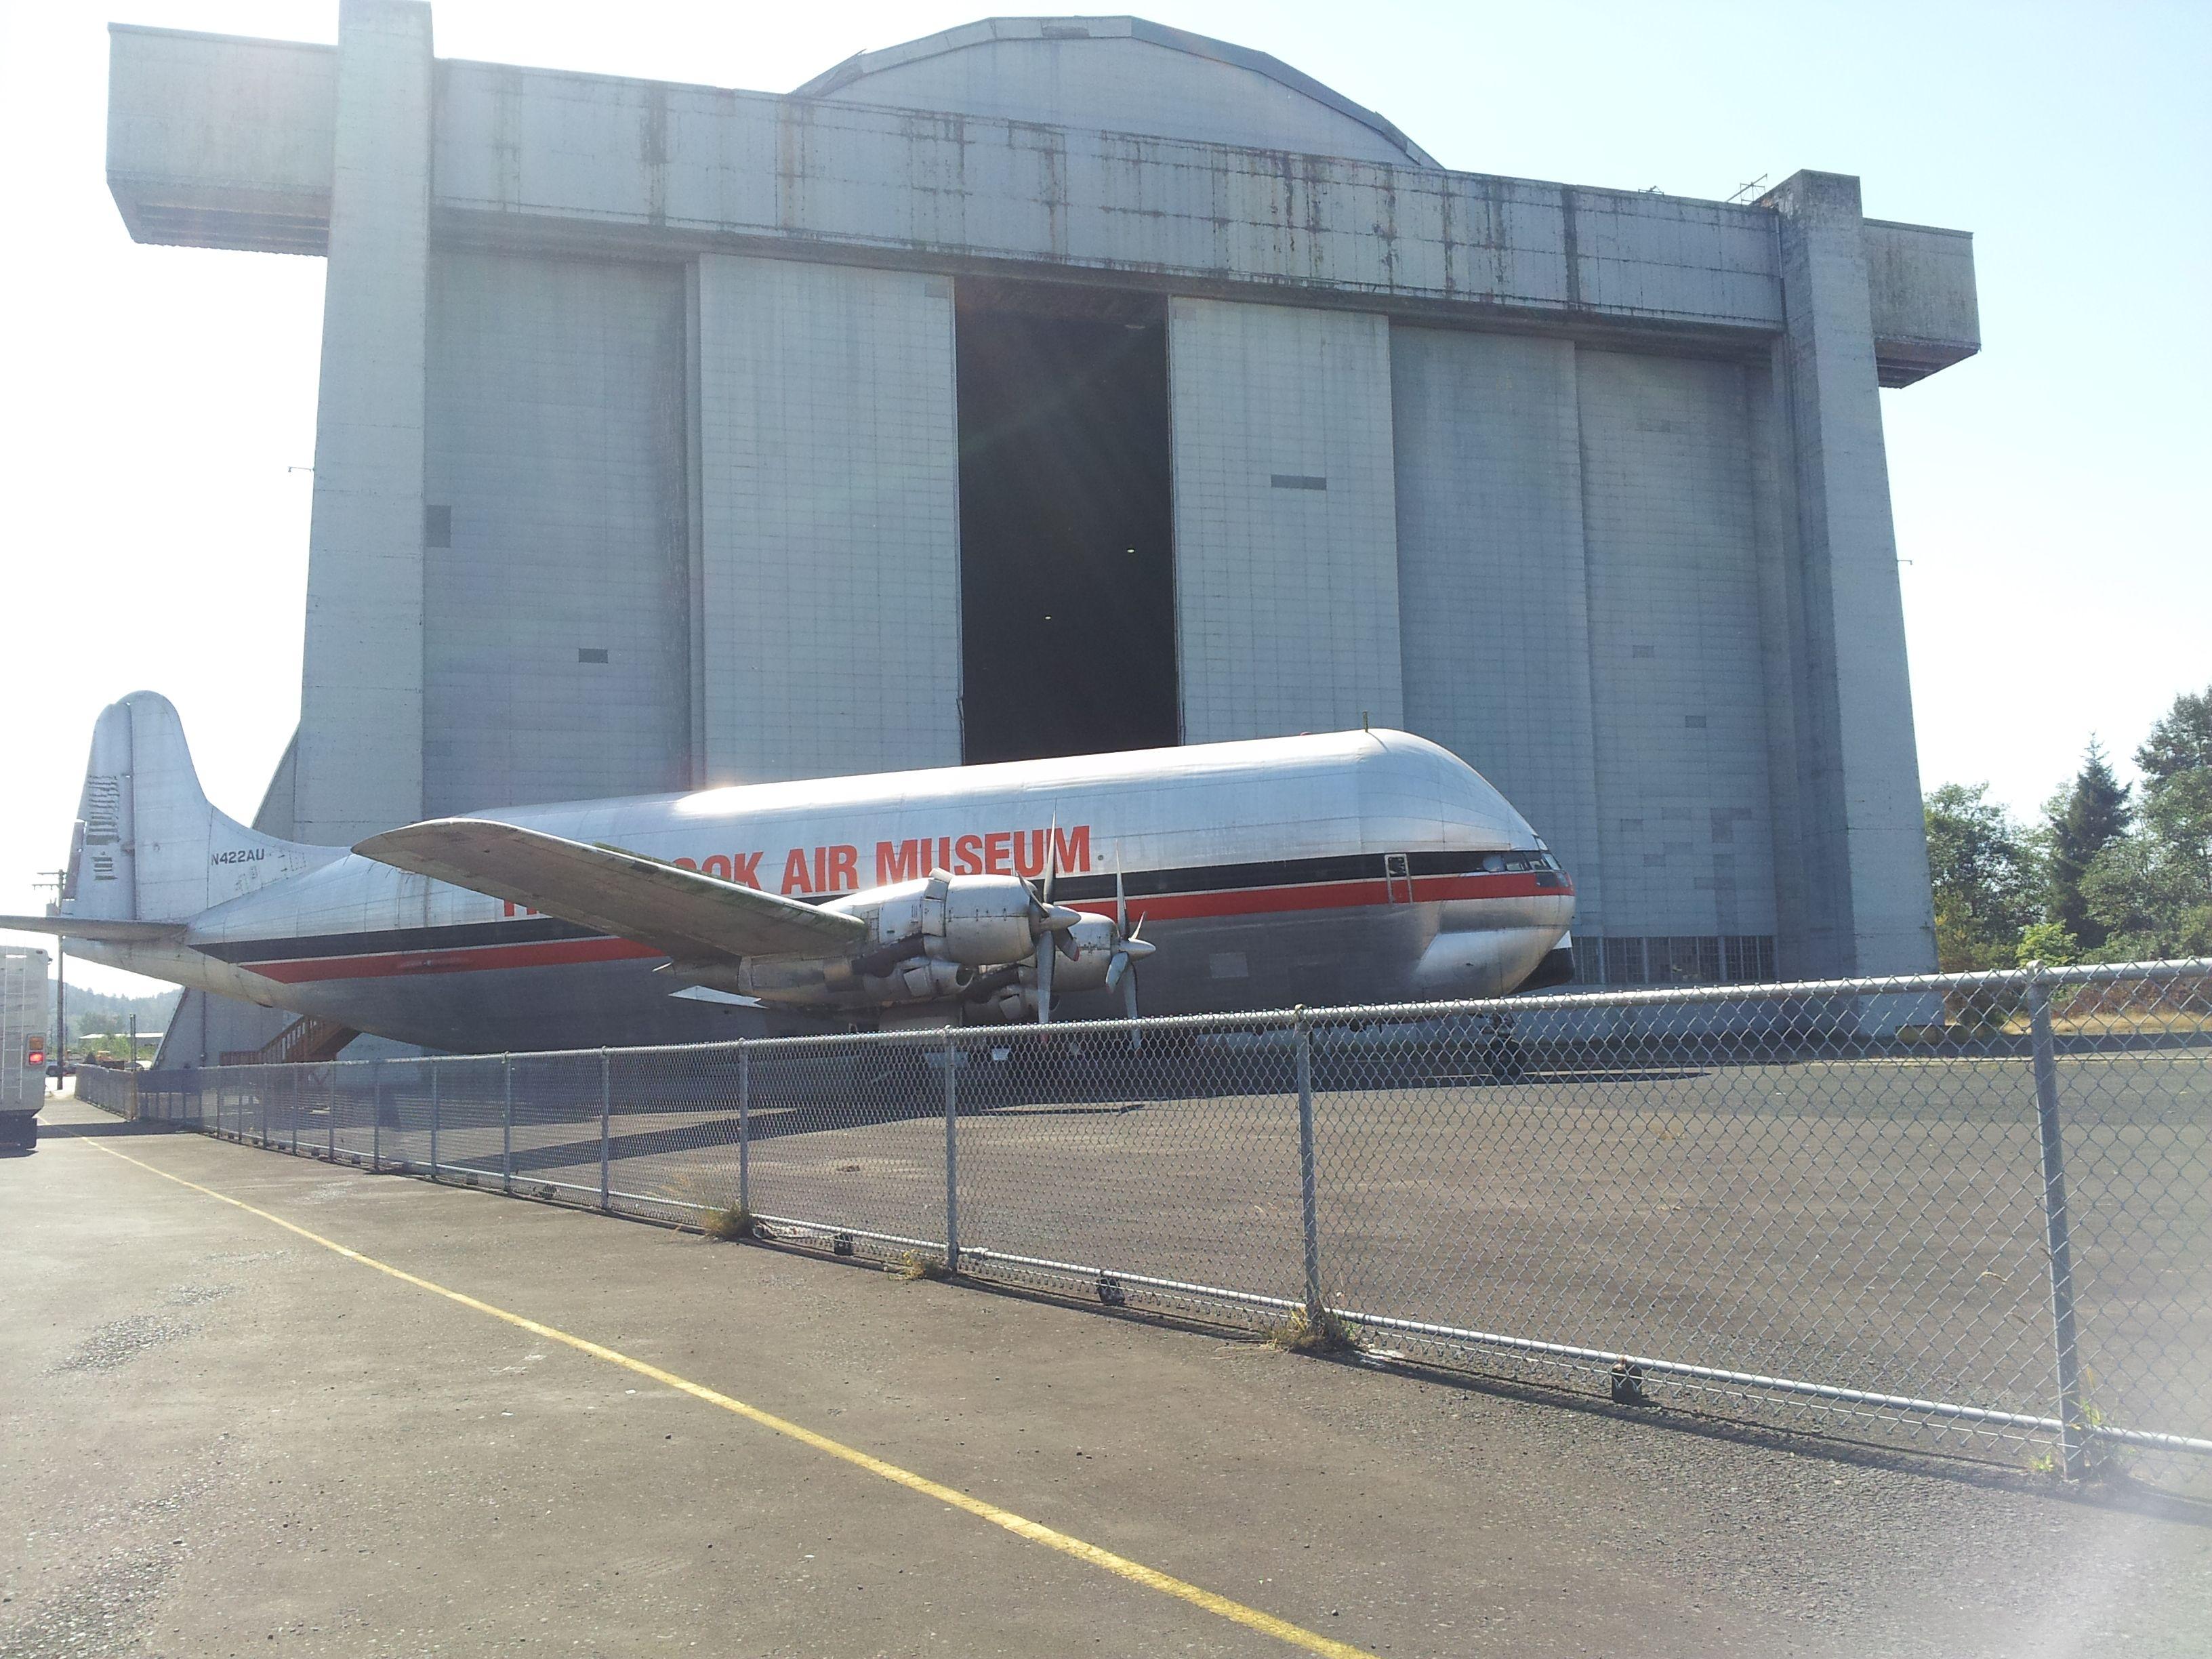 Tillamook Air Museum, a converted WWII blimp hanger filled